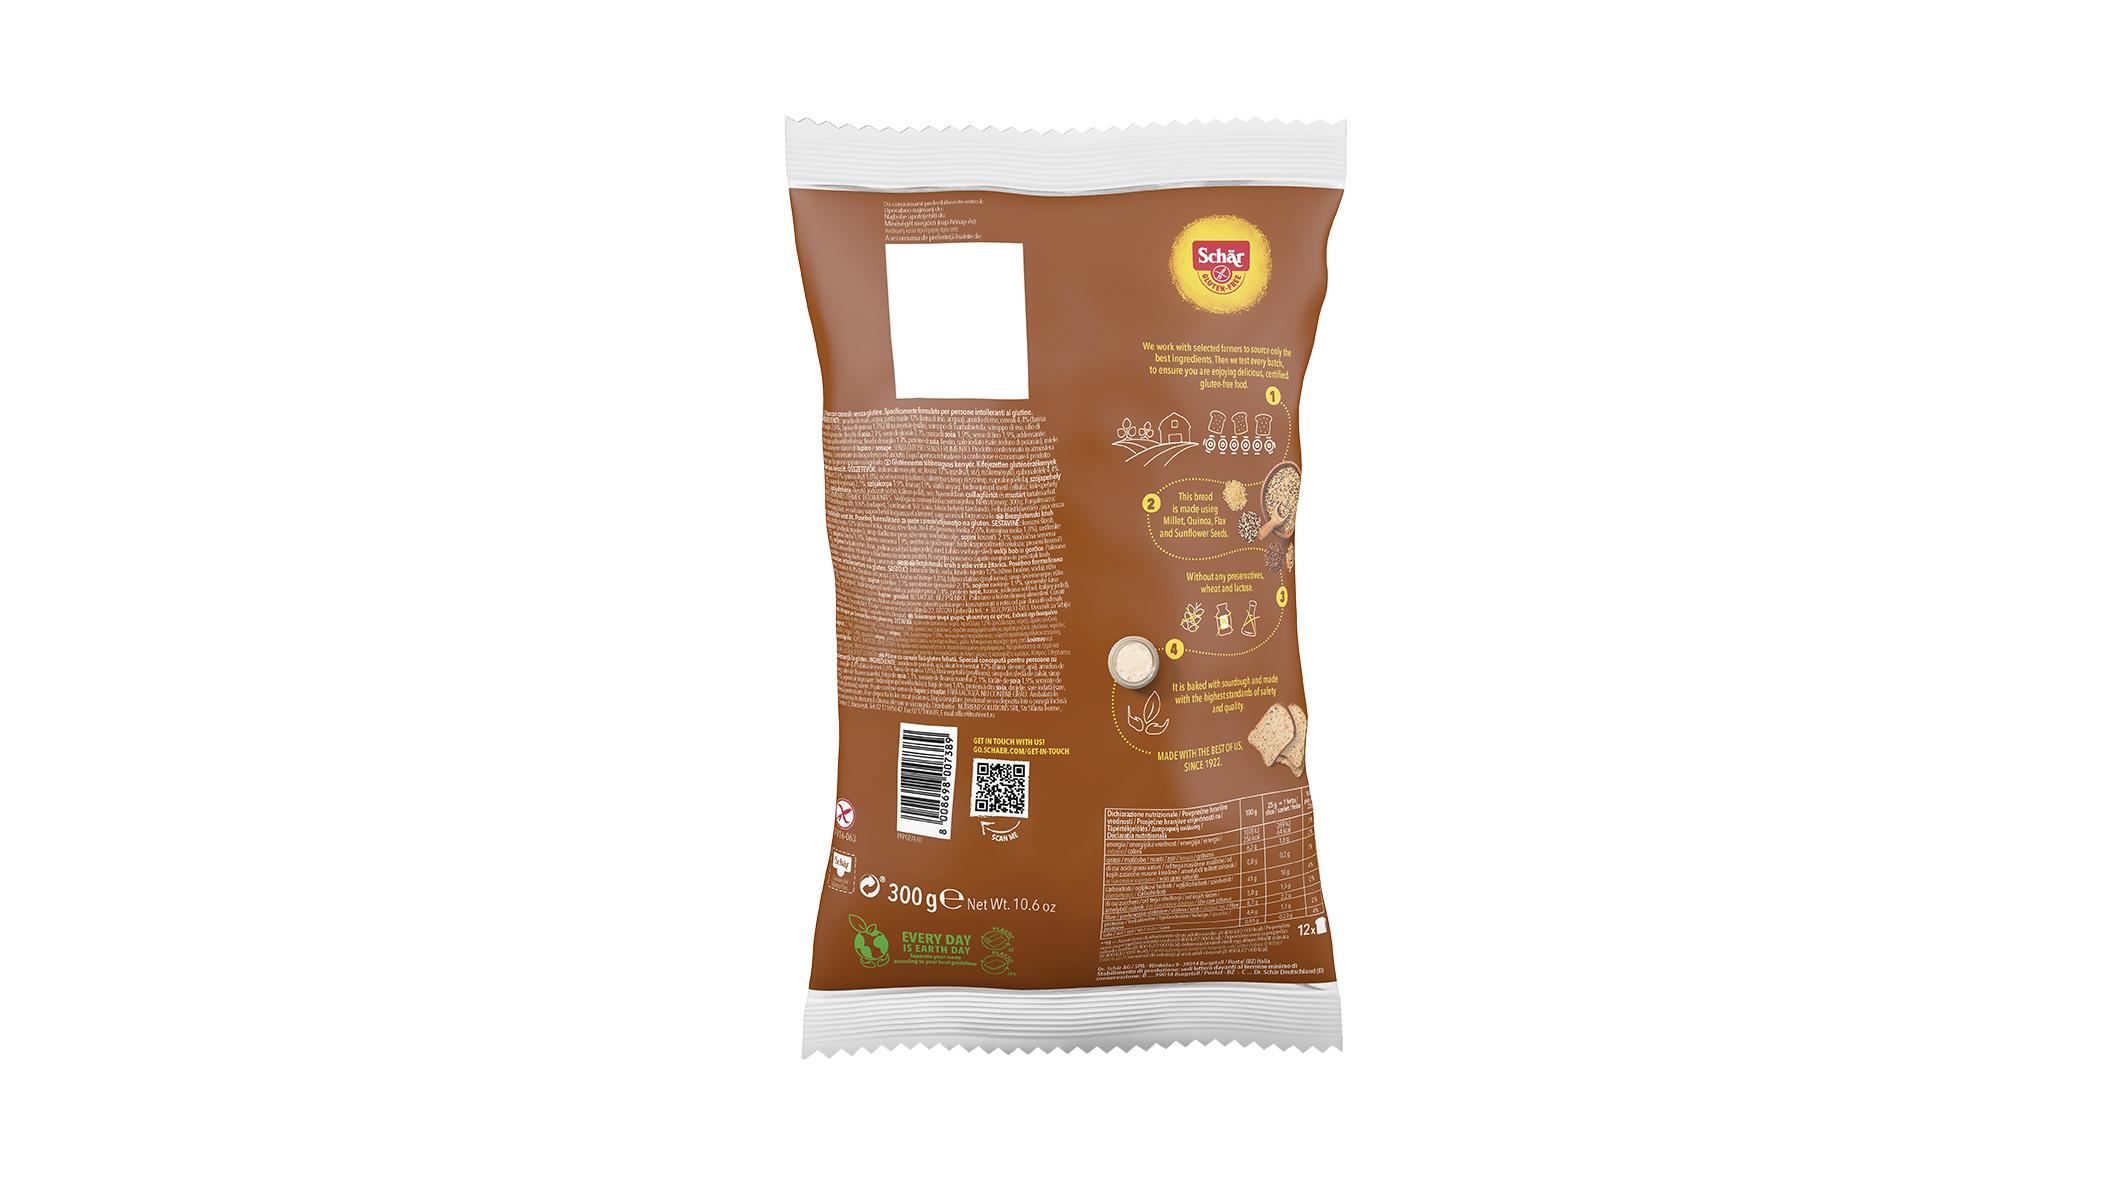 Bezglutenski kruh sa sjemenkama - Cereale del Mastro Panettiere